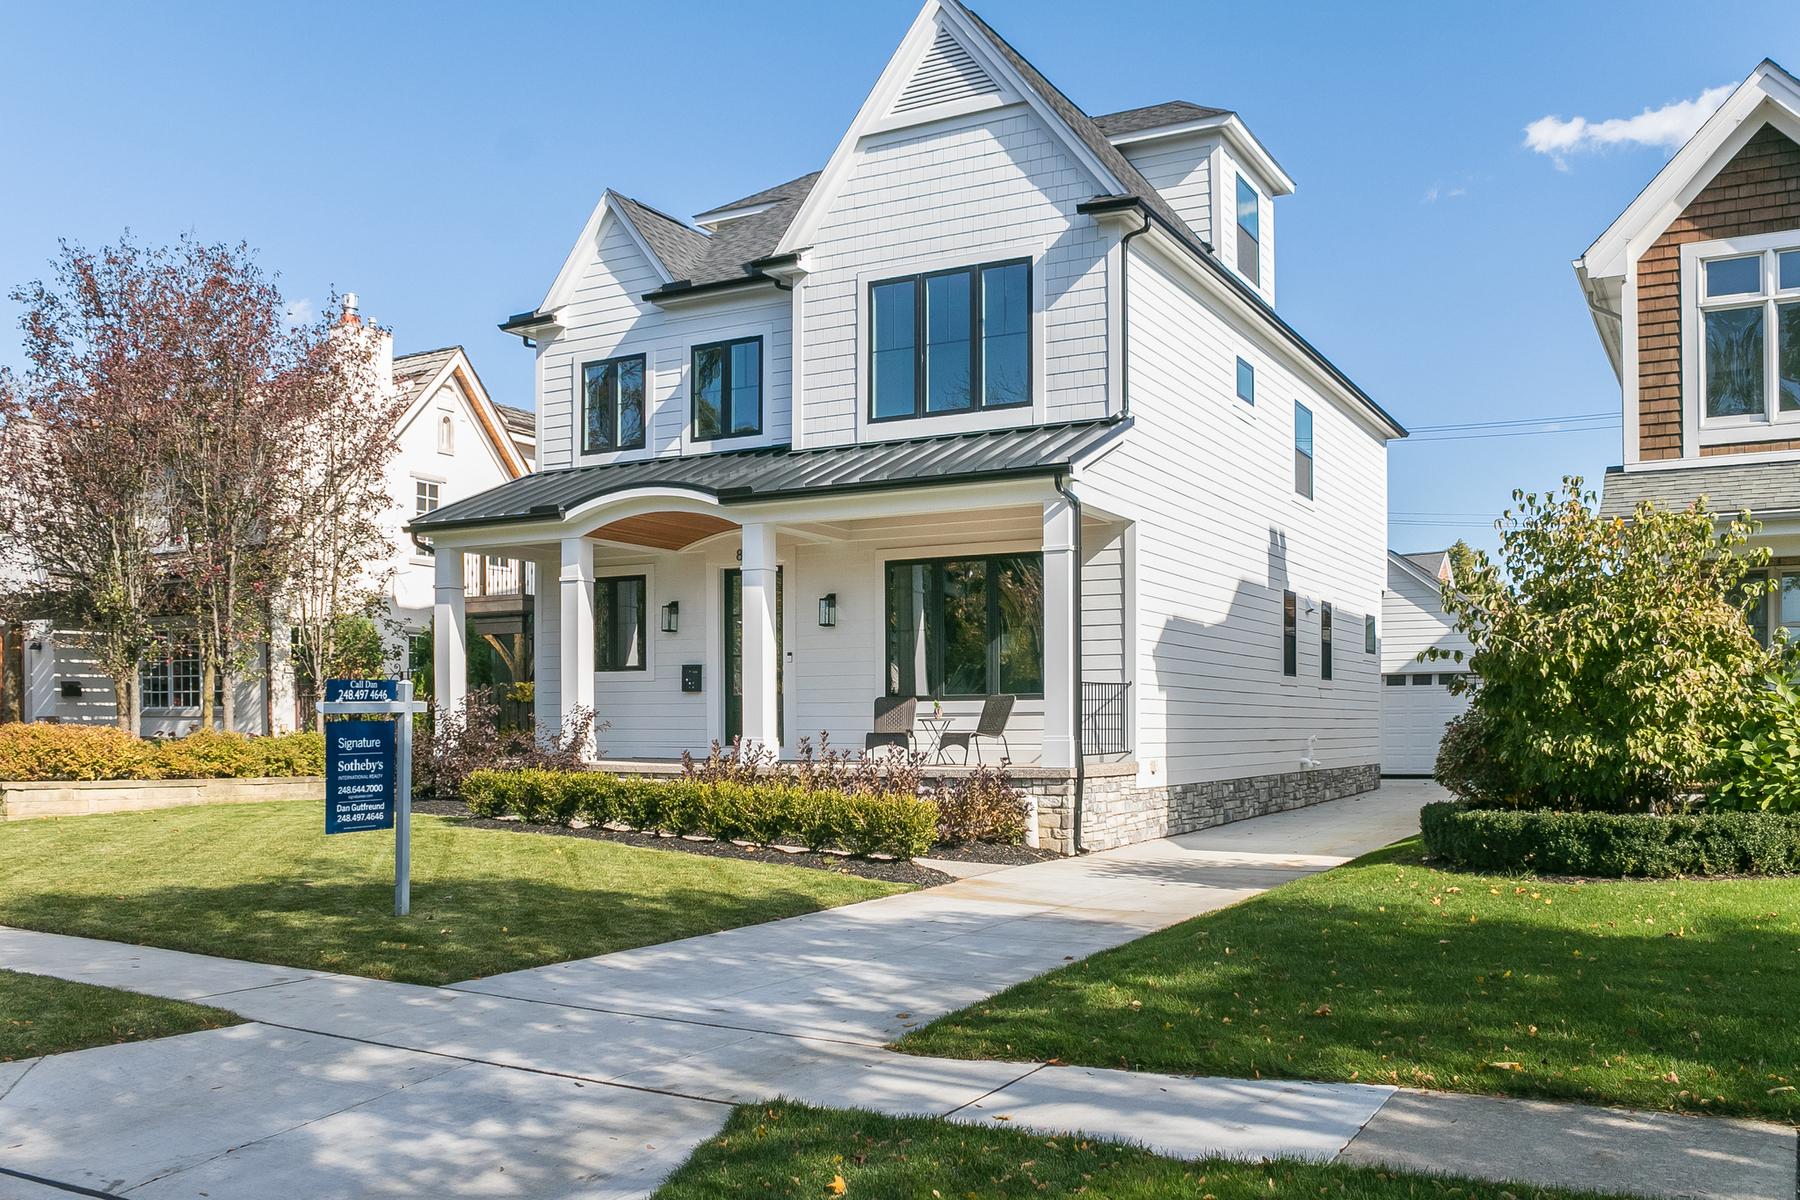 Single Family Homes for Sale at Birmingham 863 S Bates Birmingham, Michigan 48009 United States